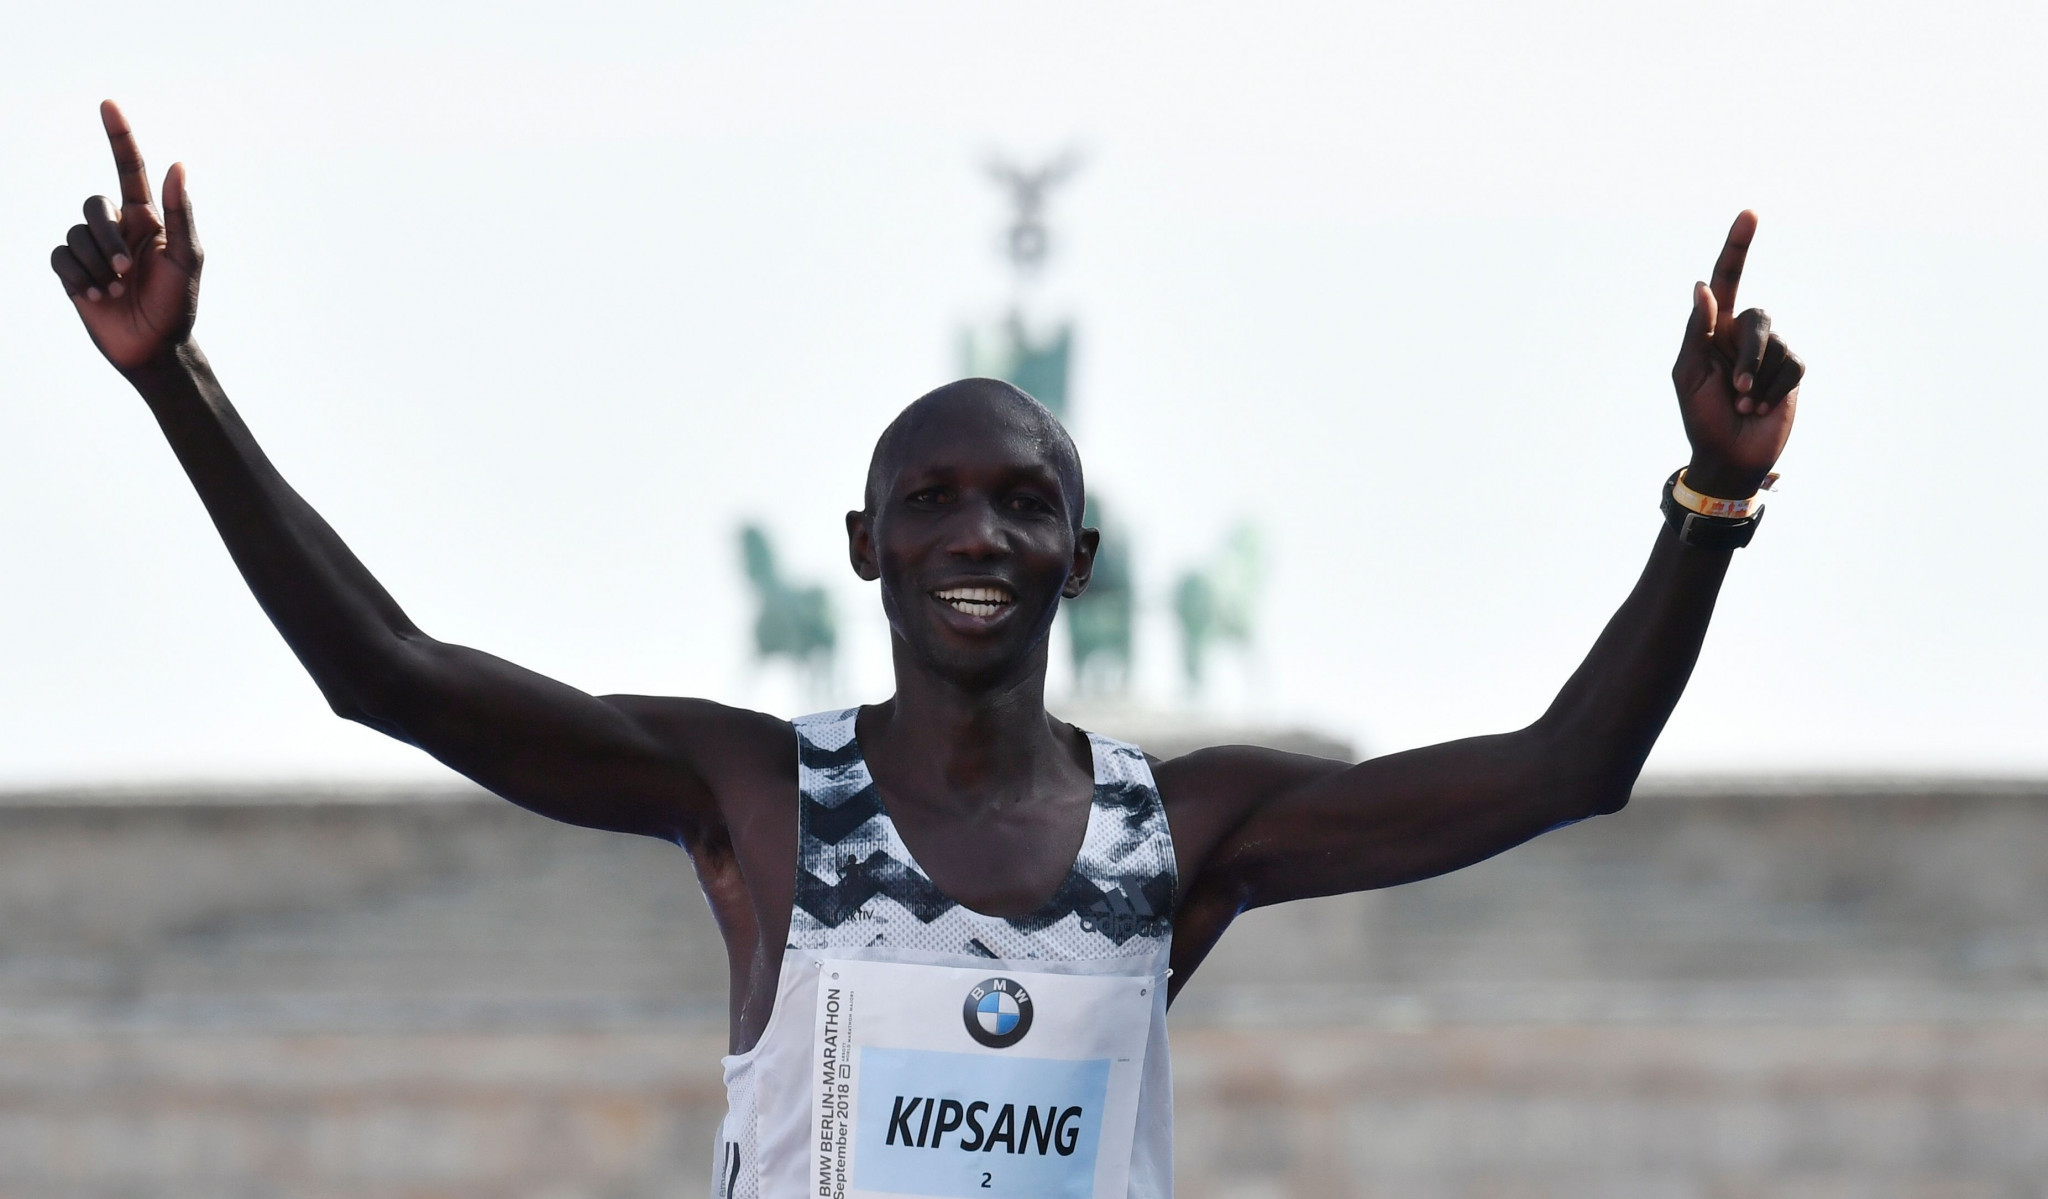 Kipsang blames poor relations with Athletics Kenya and ADAK for doping ban